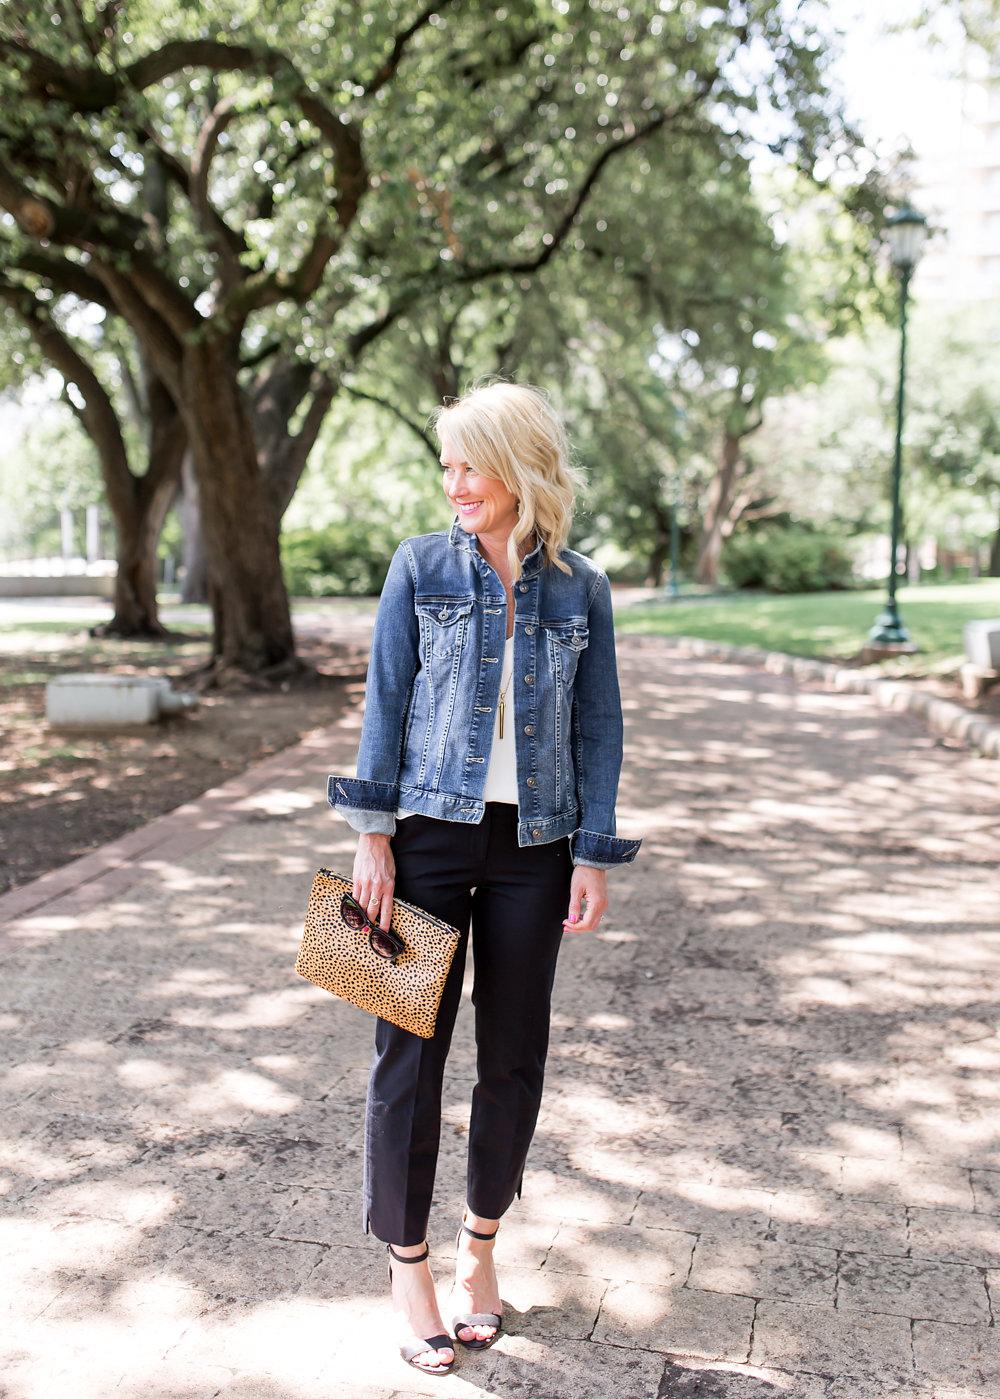 Jean jacket black white hi sugarplum bloglovin Hi sugarplum